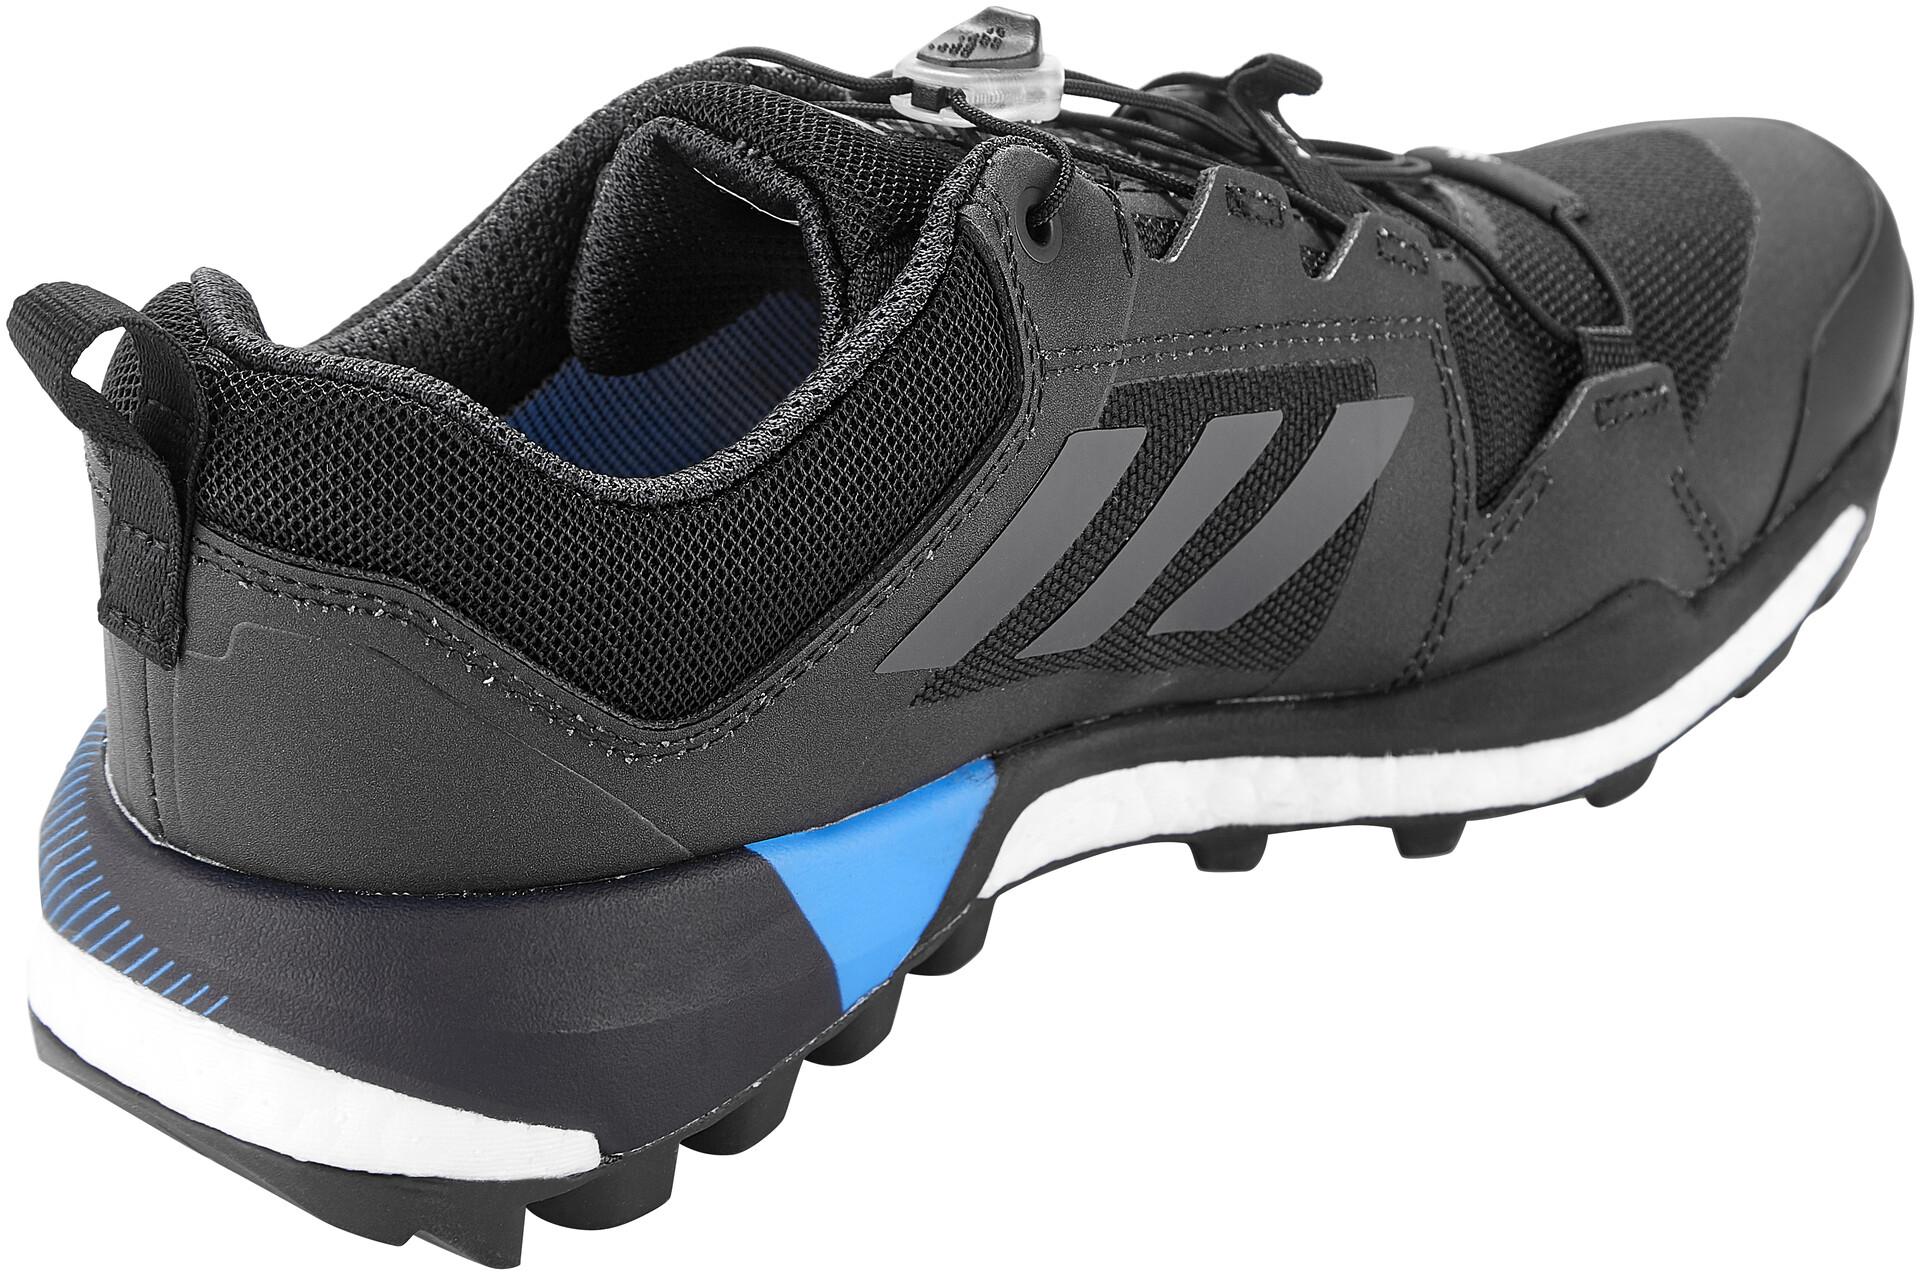 adidas TERREX Skychaser XT GTX Low Cut Schoenen Dames, core black/grey  four/real blue